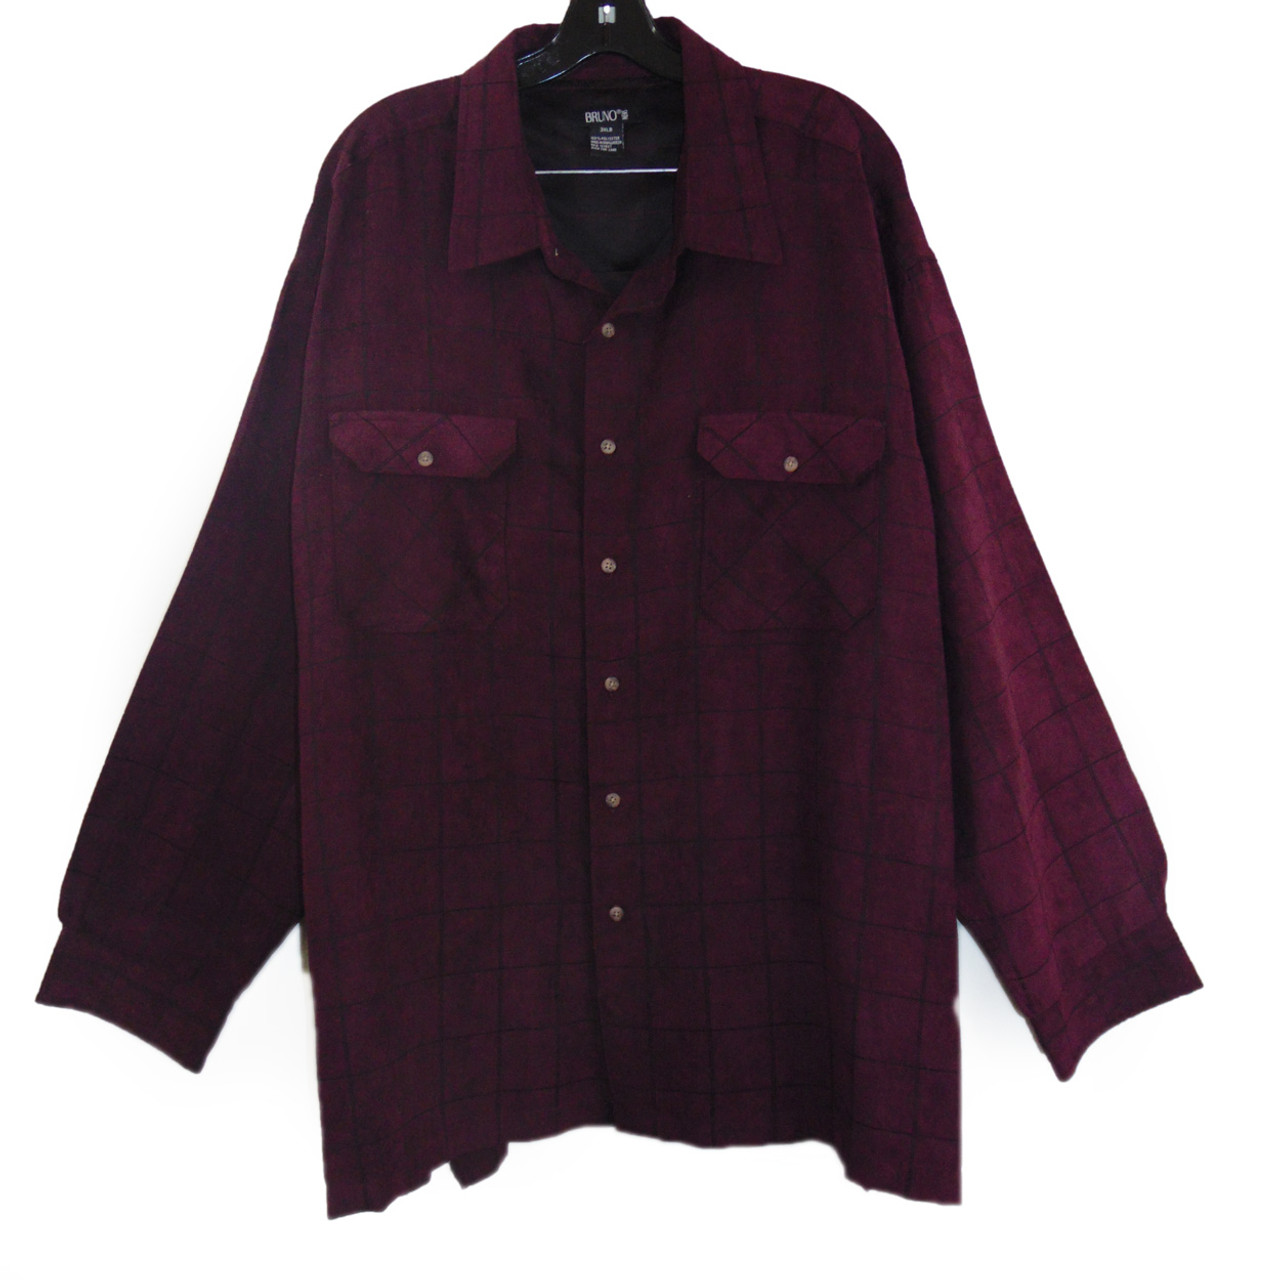 083cab86c3f Bruno Burgundy Checkered Casual Shirt Size 3X